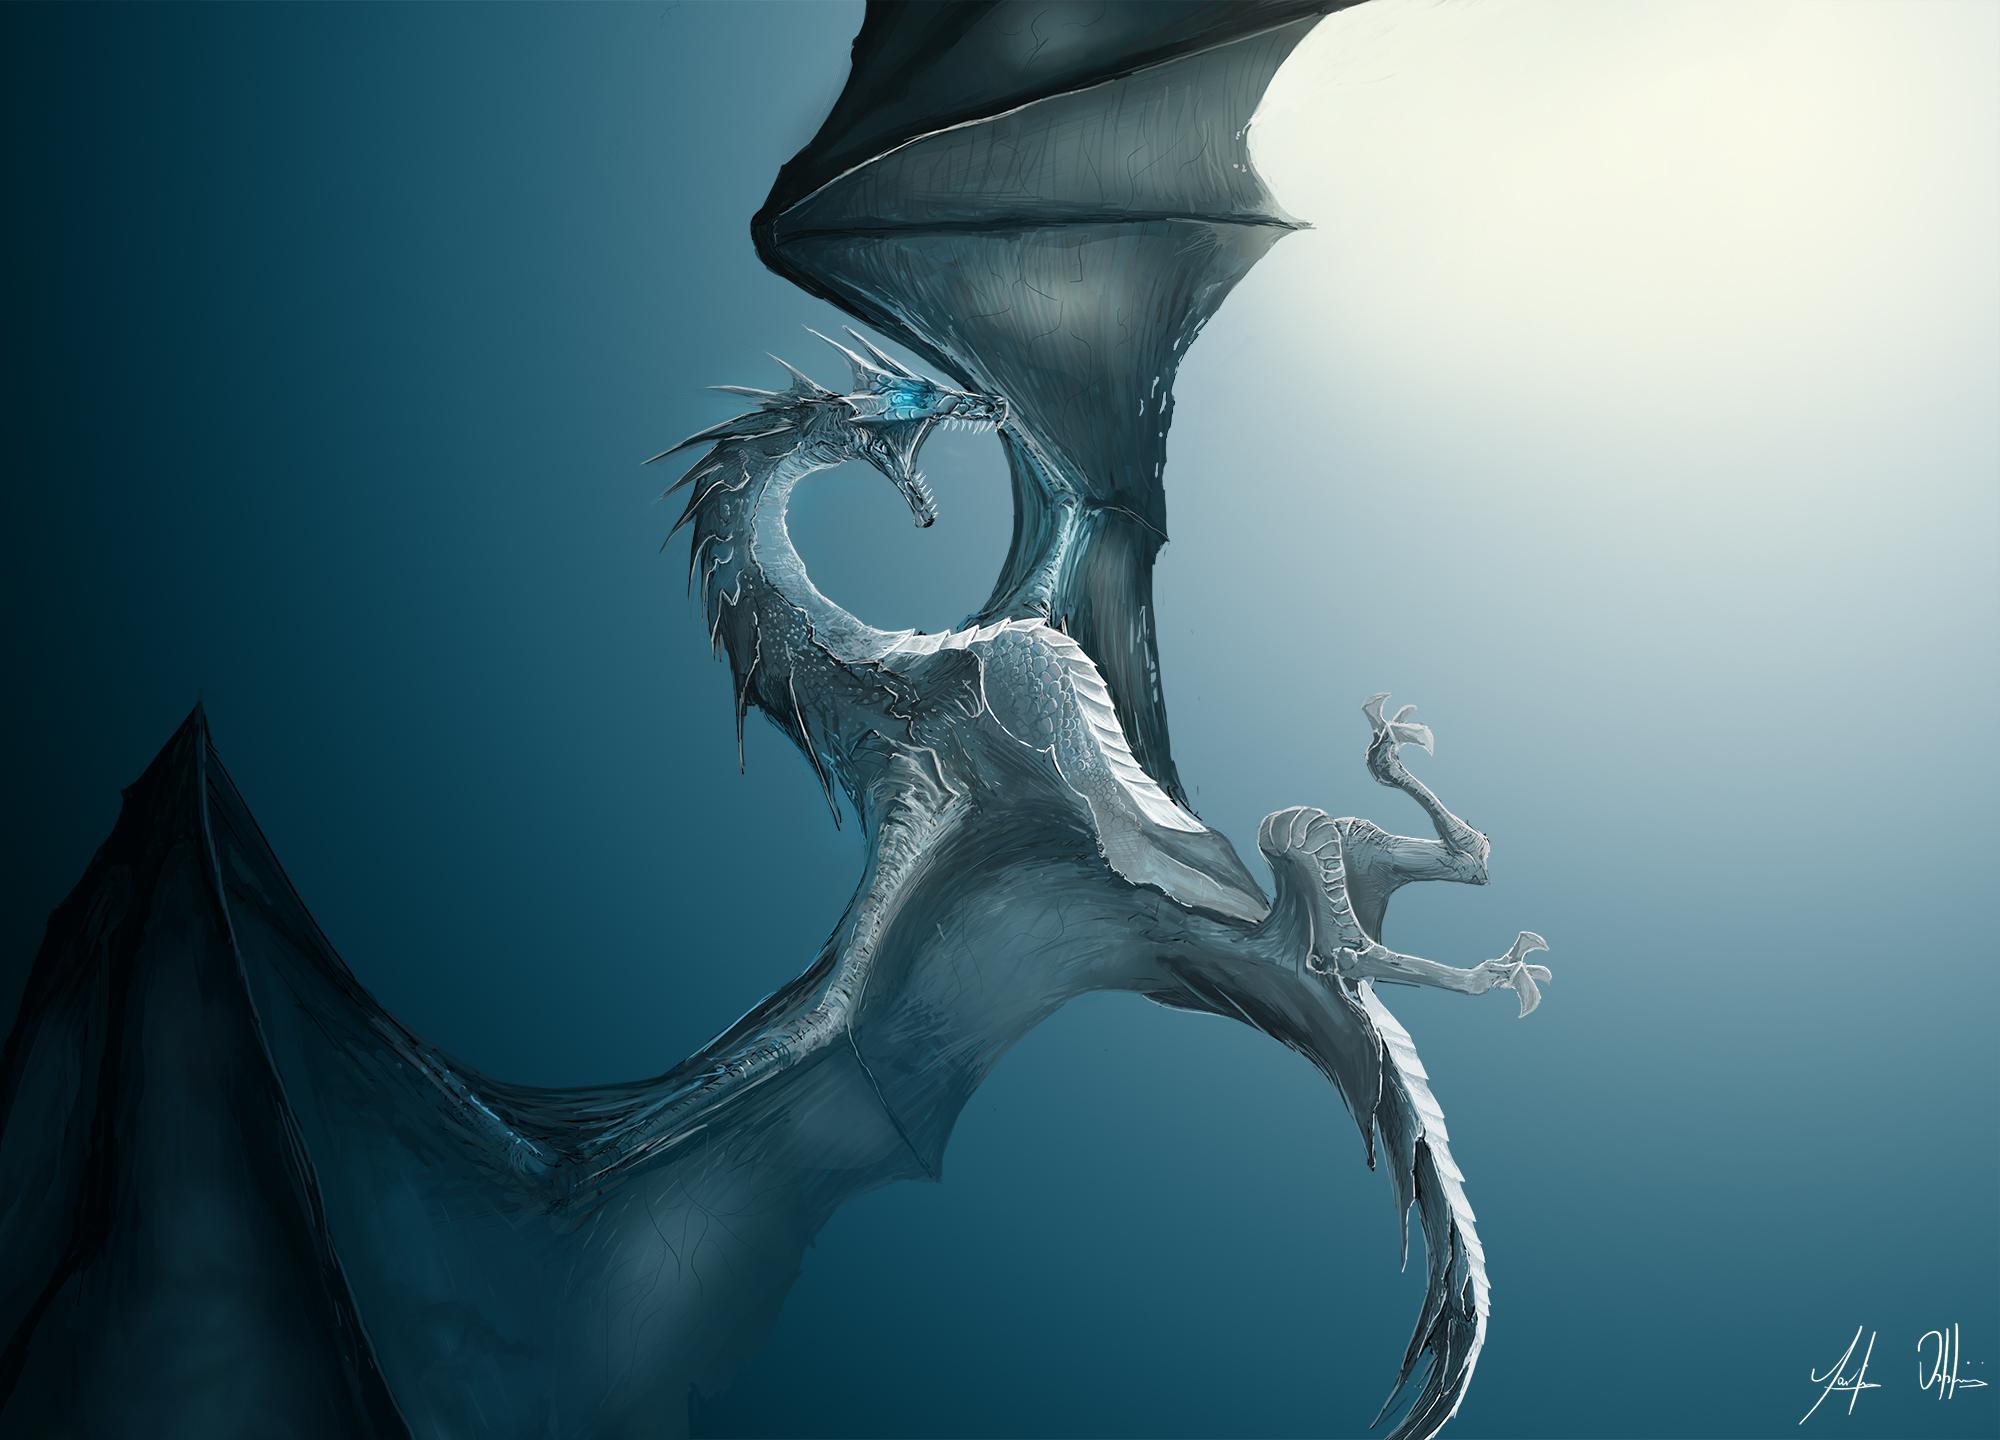 Realistic Flying Ice Dragon 2295850 Hd Wallpaper